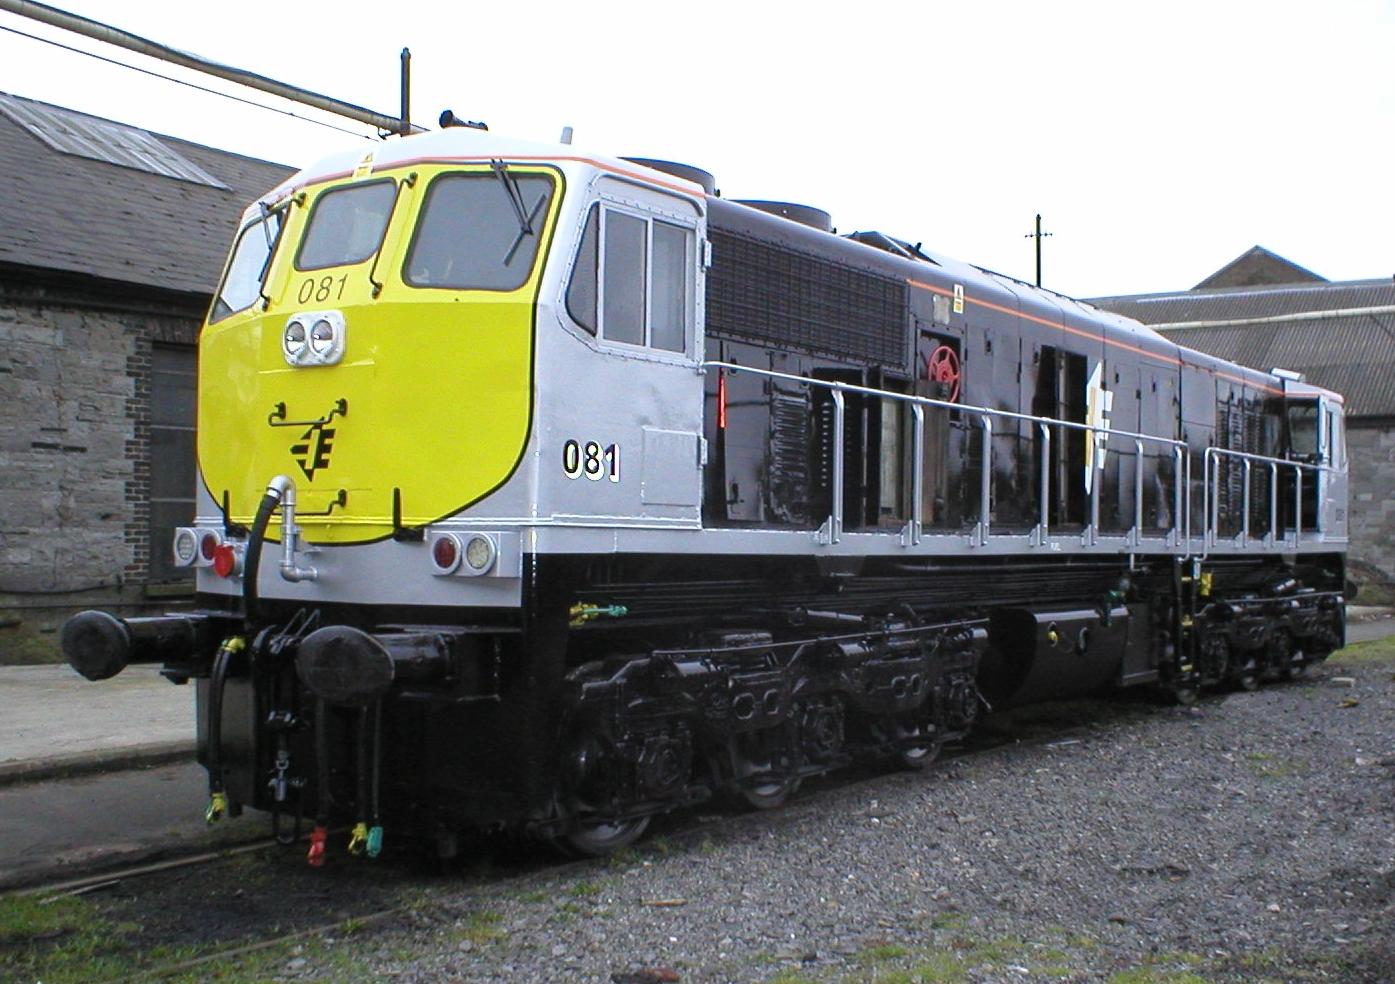 Cie 071 Class Nir Class 111 Wikipedia